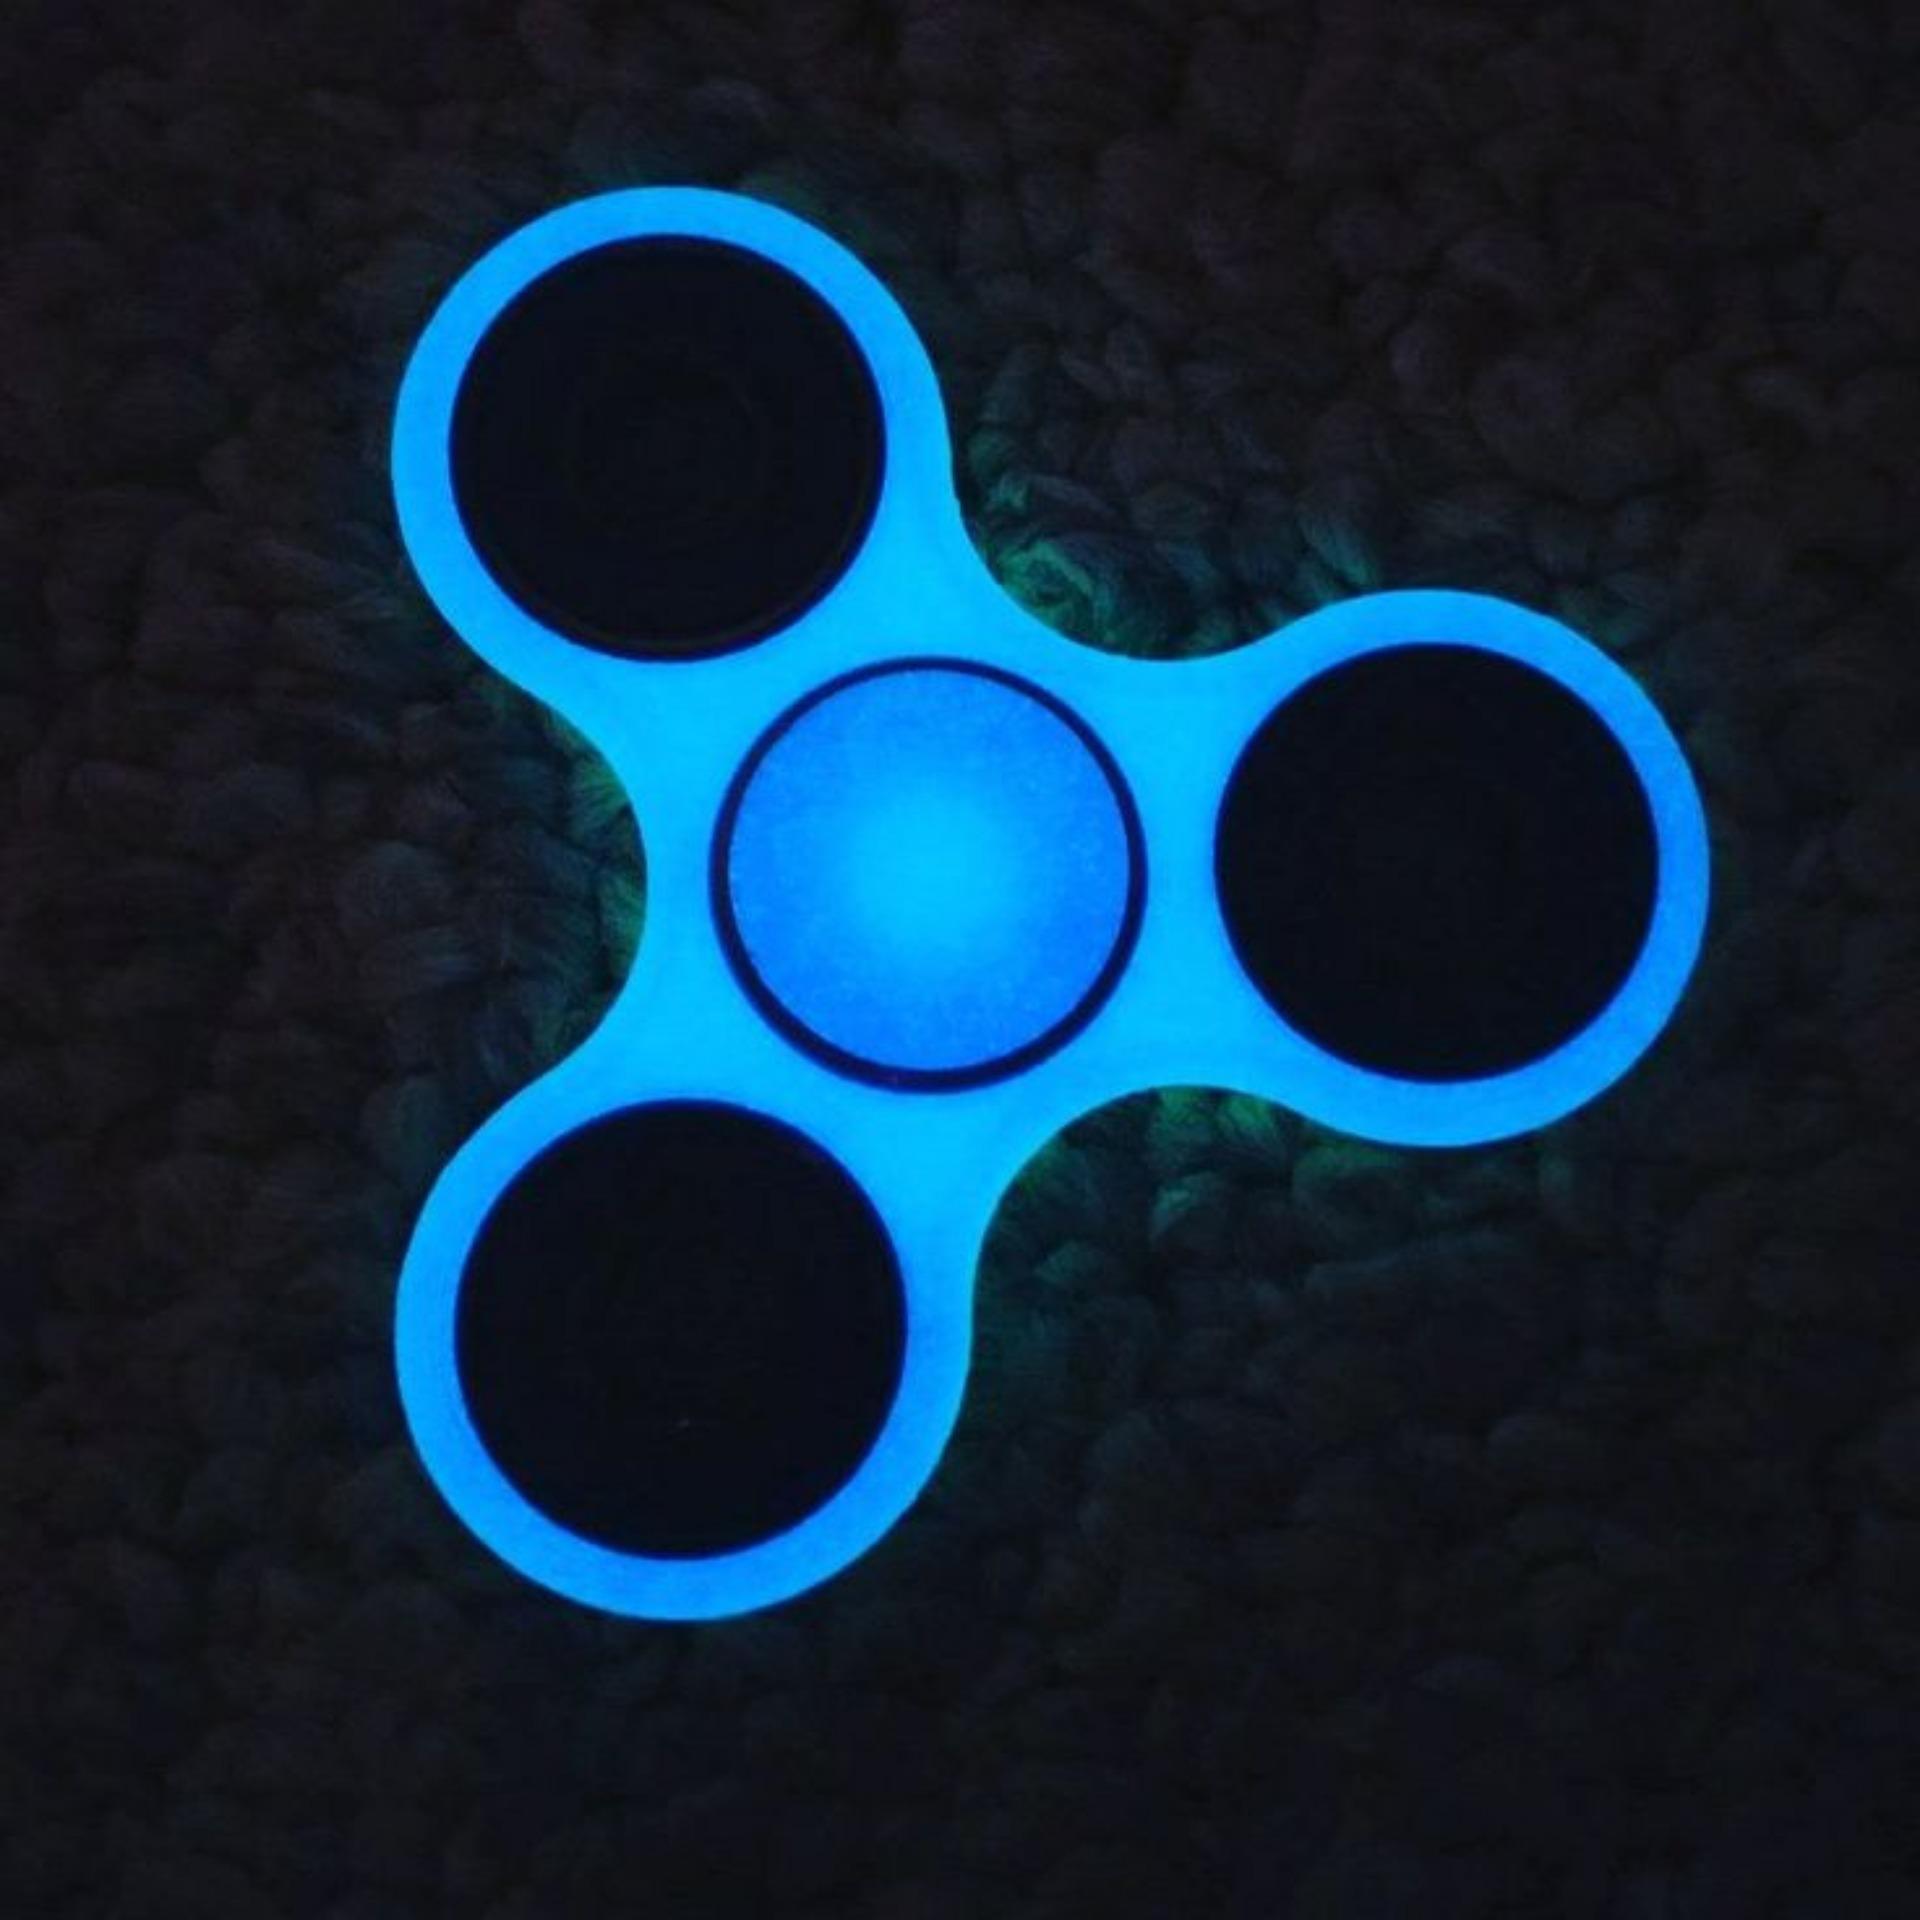 Fidget Spinner Ceramic Toys Tri Ball Bearing Edc Sensory Triangle Keramik Glow In The Dark